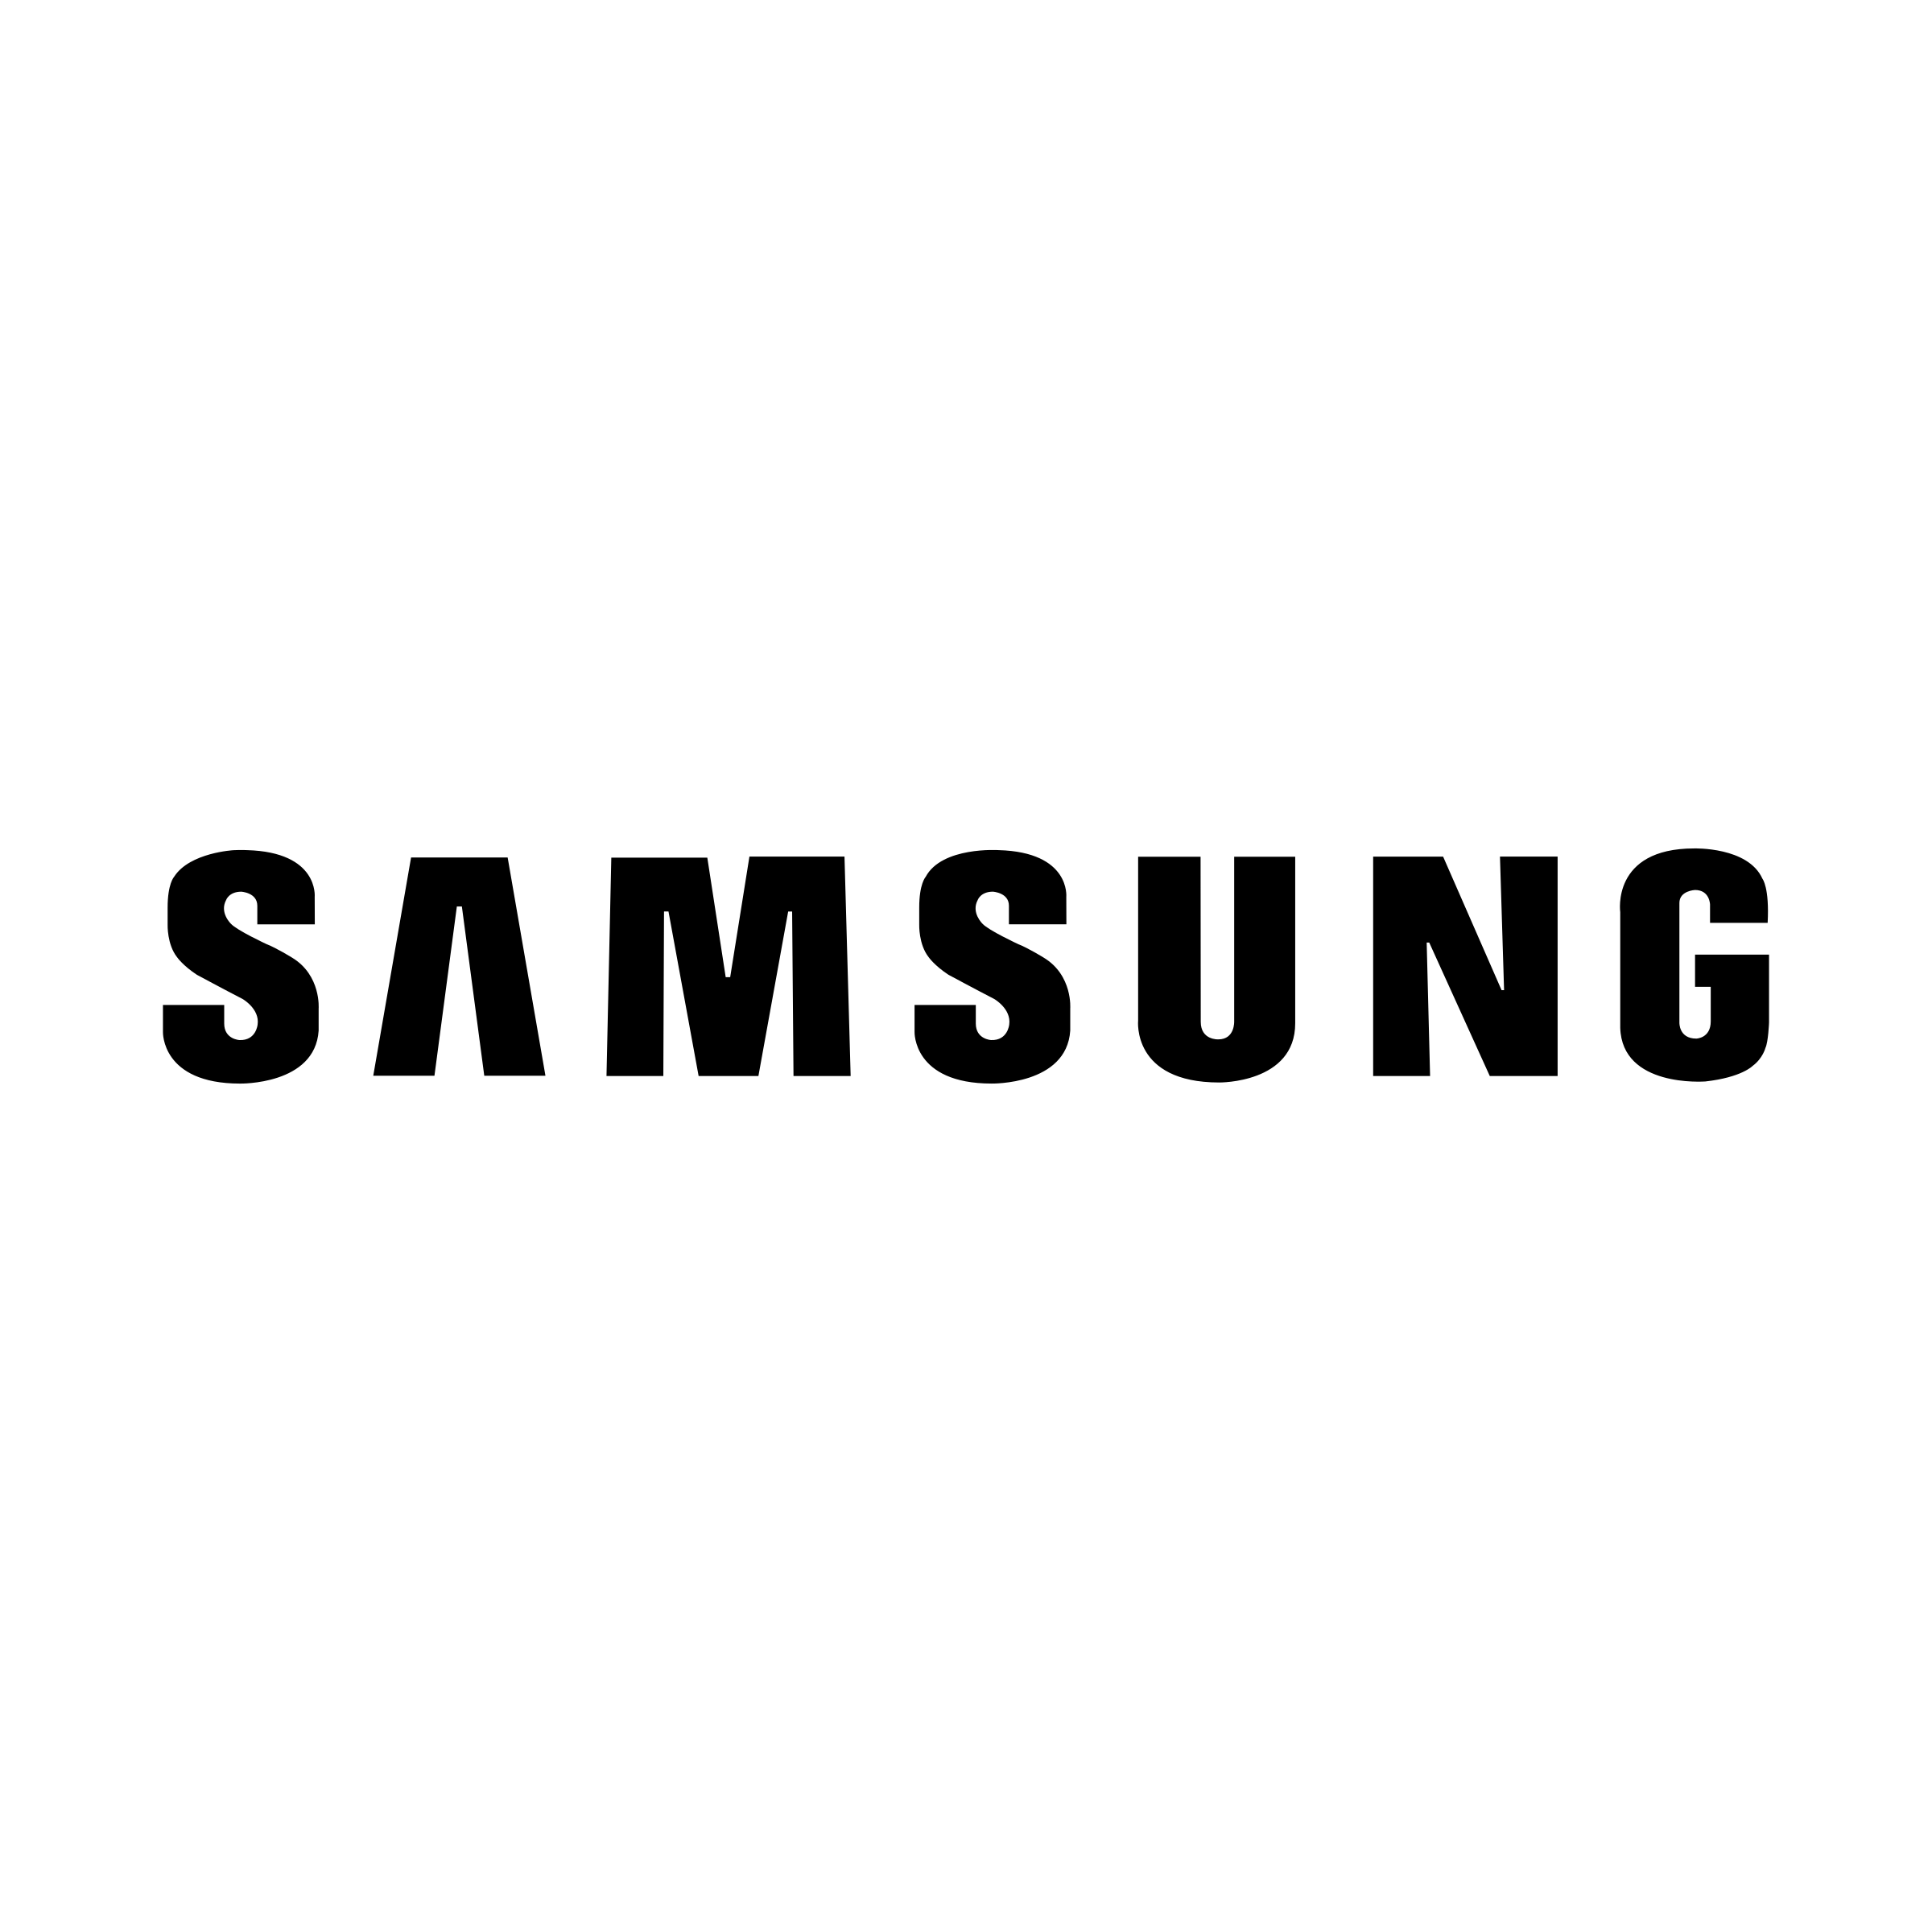 samsung-1-logo-png-transparent